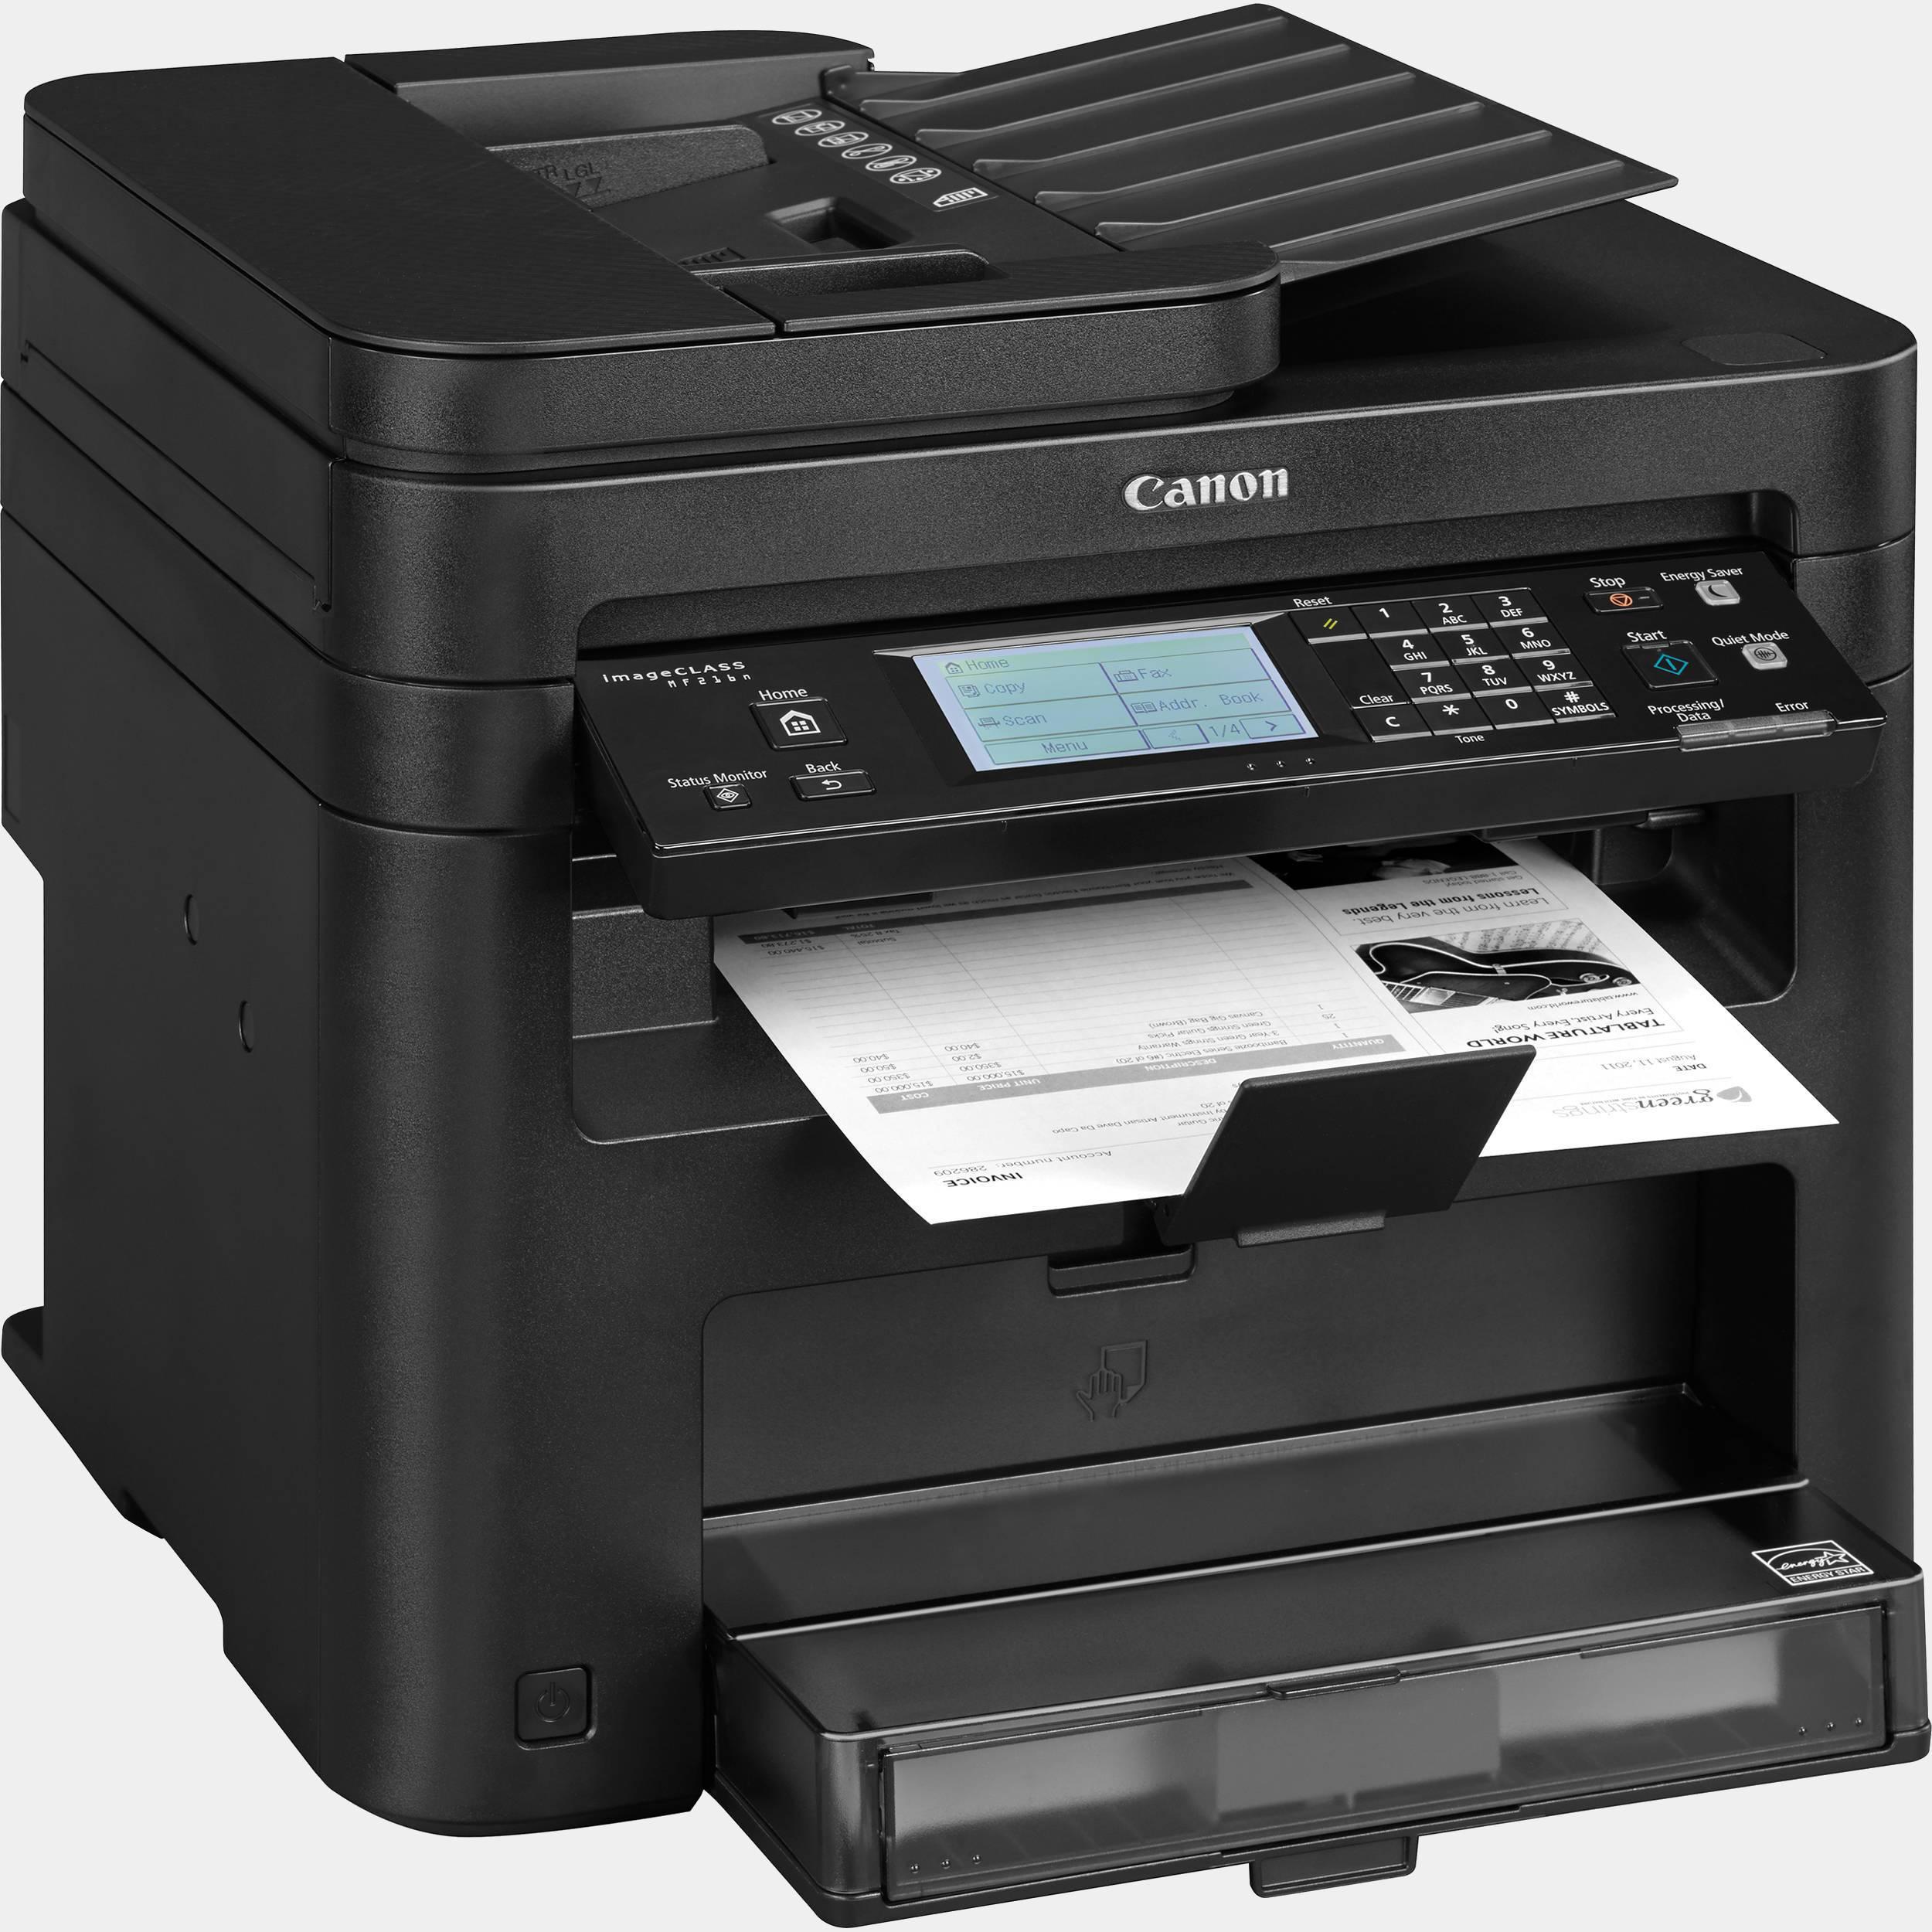 Canon I-sensys Mf216n Negra multifuncion laser monocromo